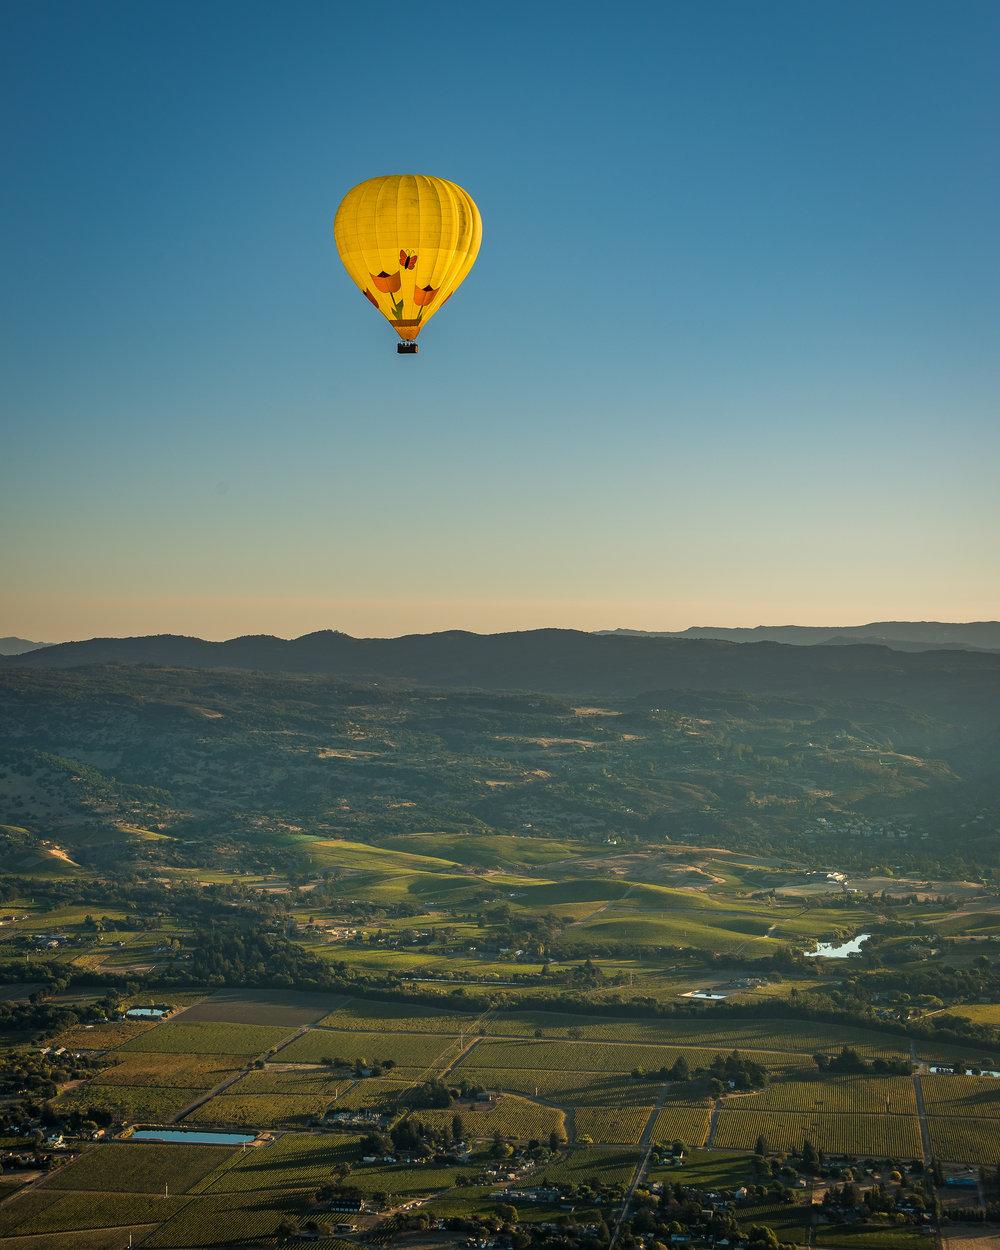 NAPA-Baloon-65.jpg